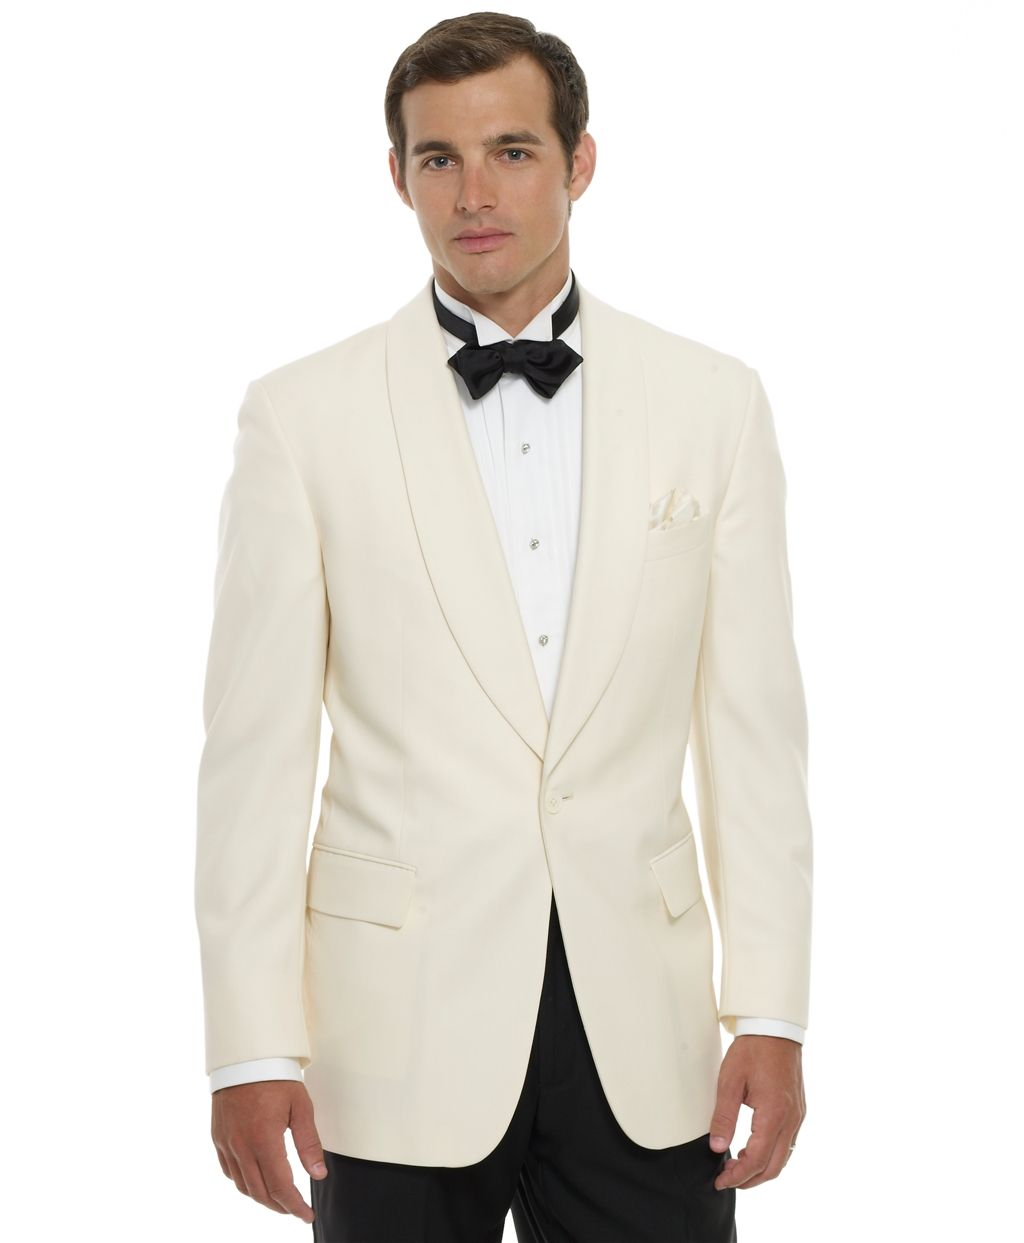 White Dinner Jacket - Brooks Brothers | CHESTI DE PURTAT | Pinterest ...